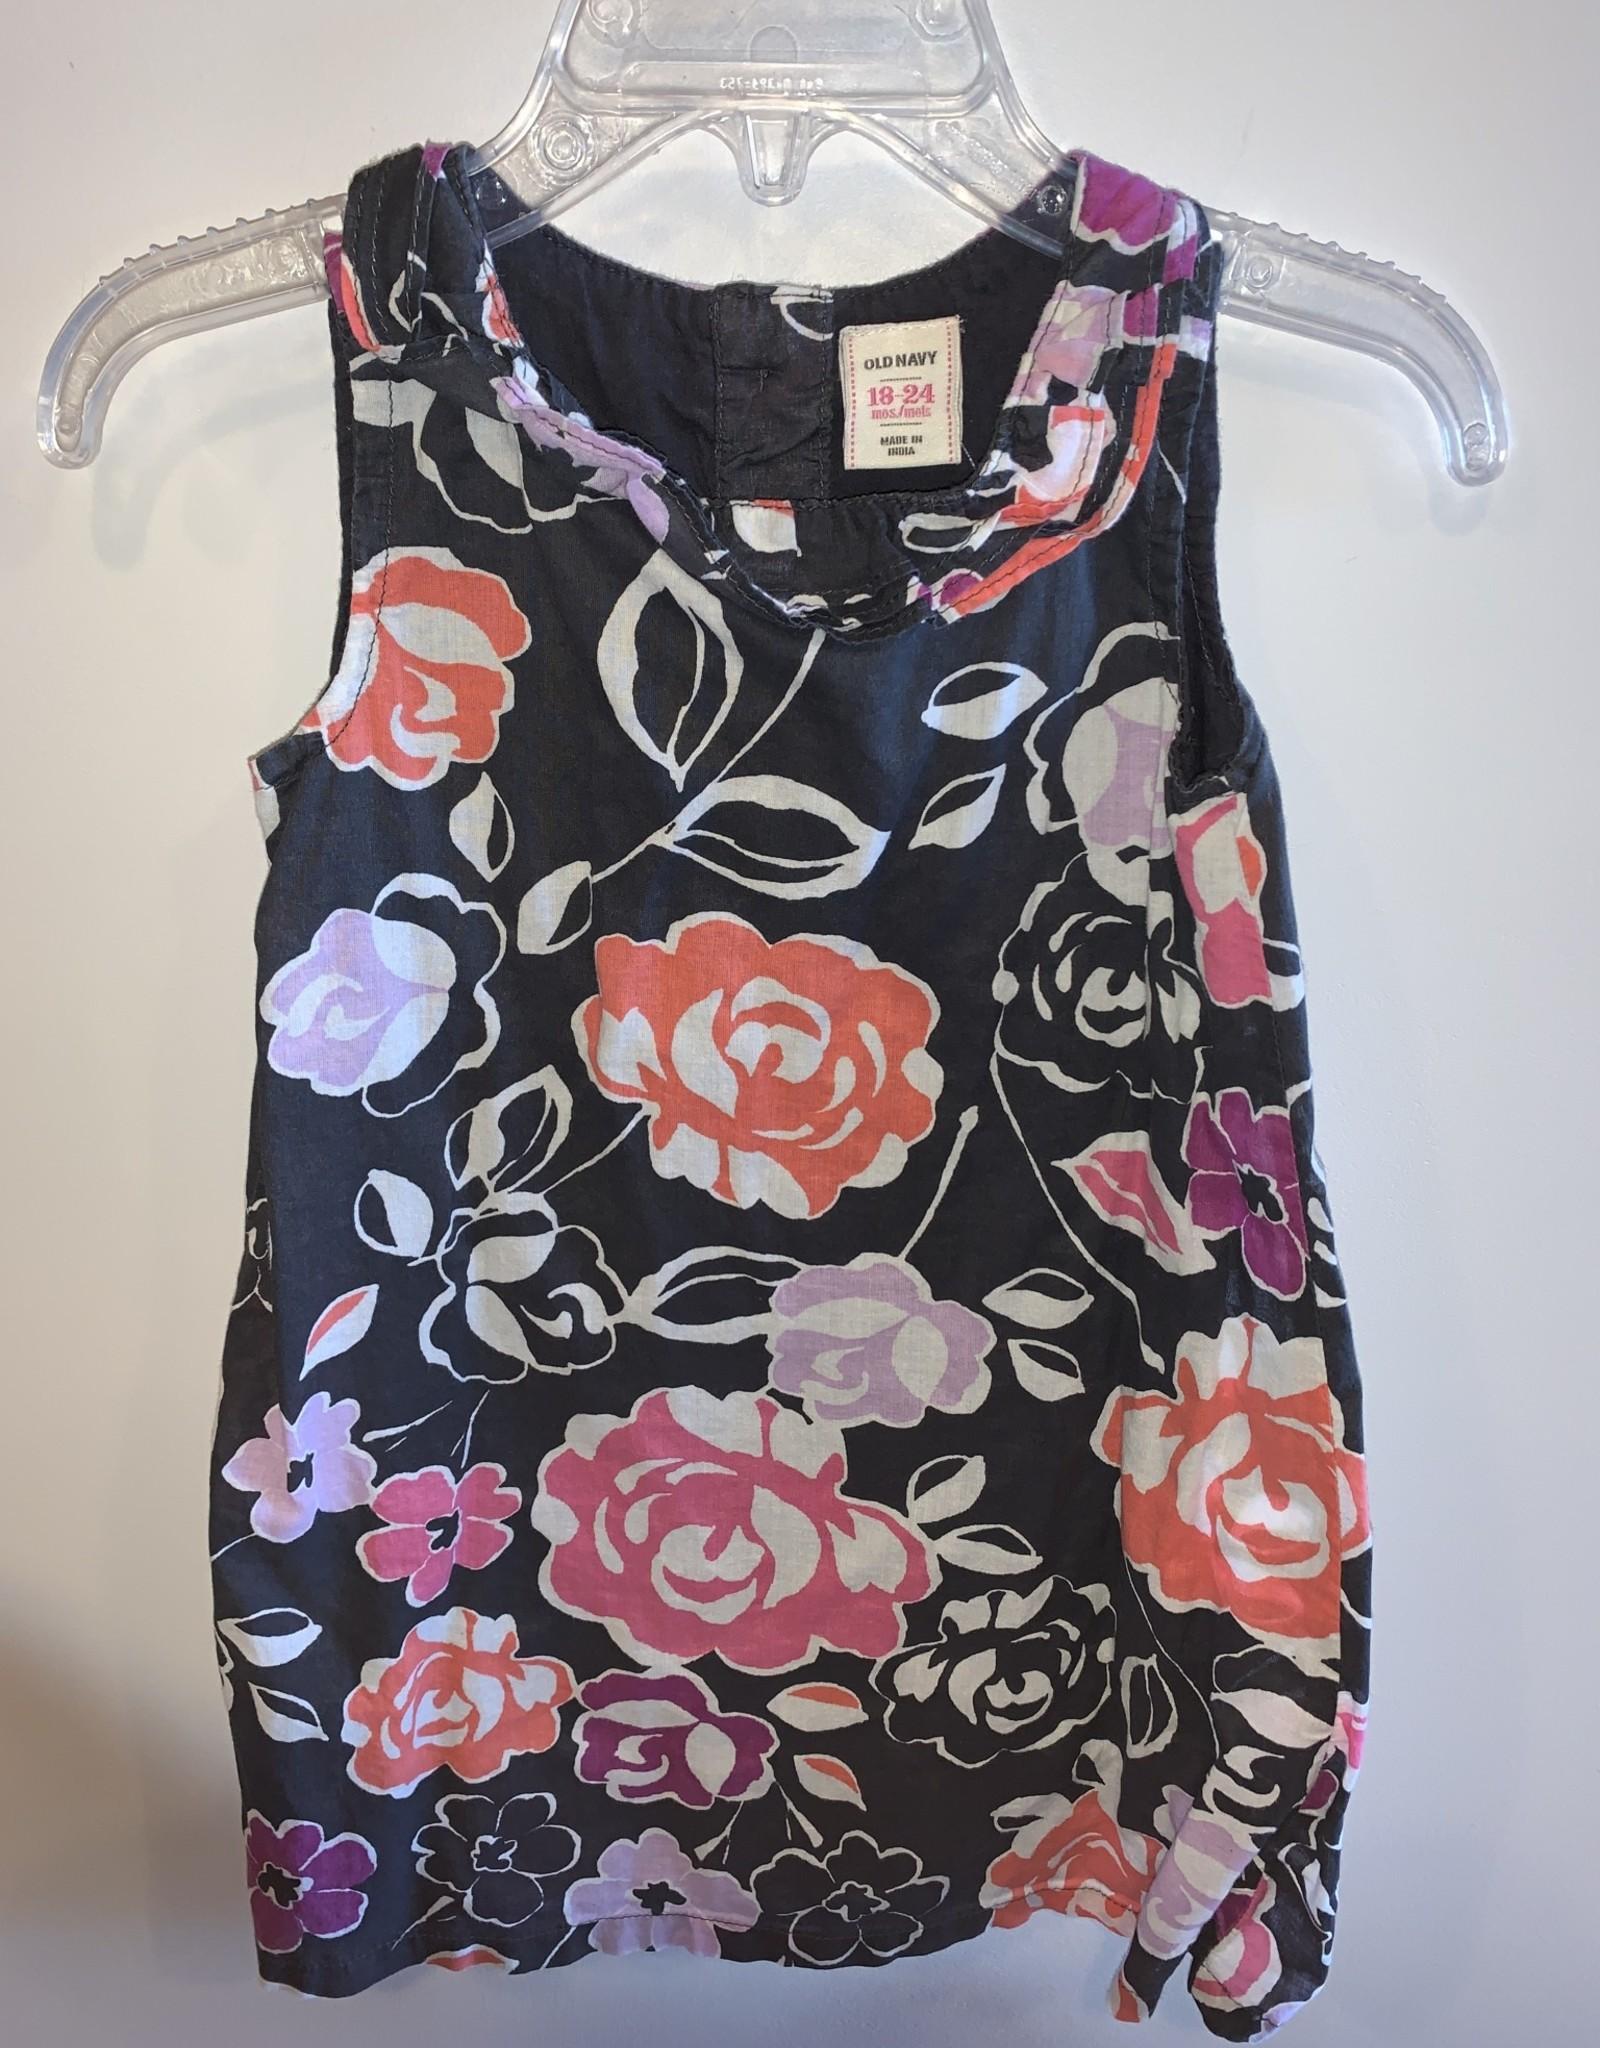 Old Navy Girls/18-24/OldNavy/Dress